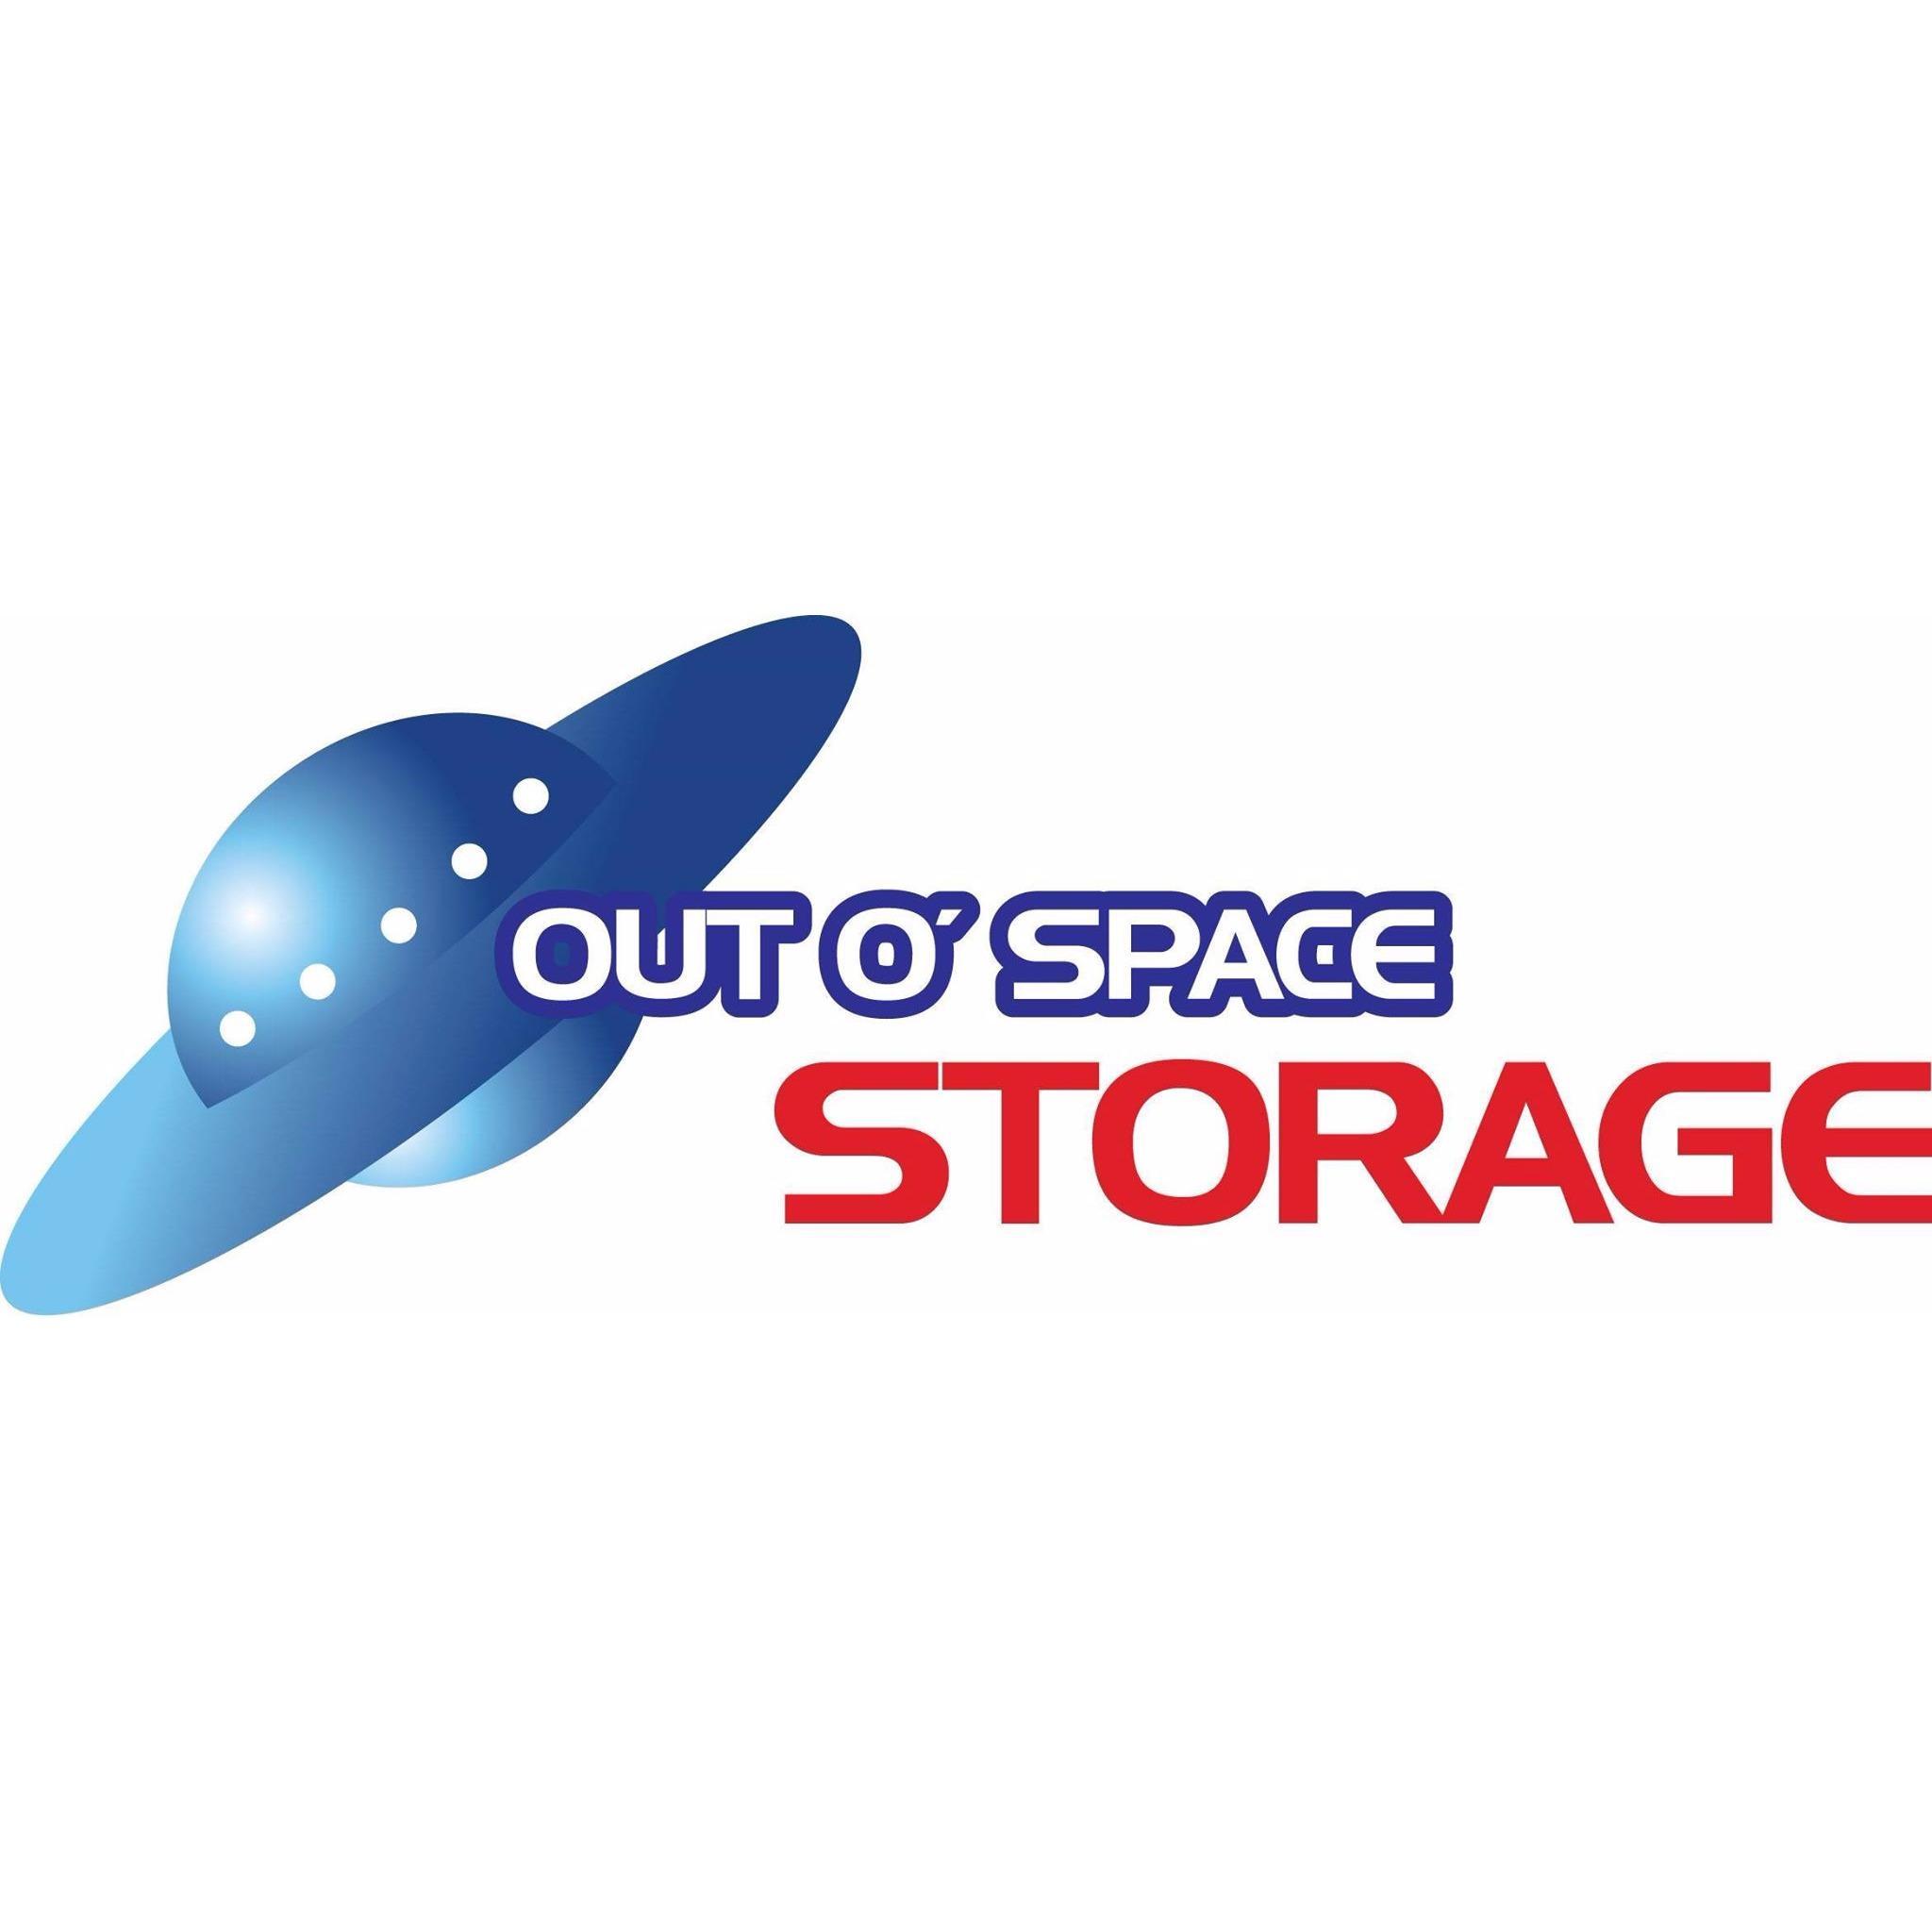 Out O' Space Dade City